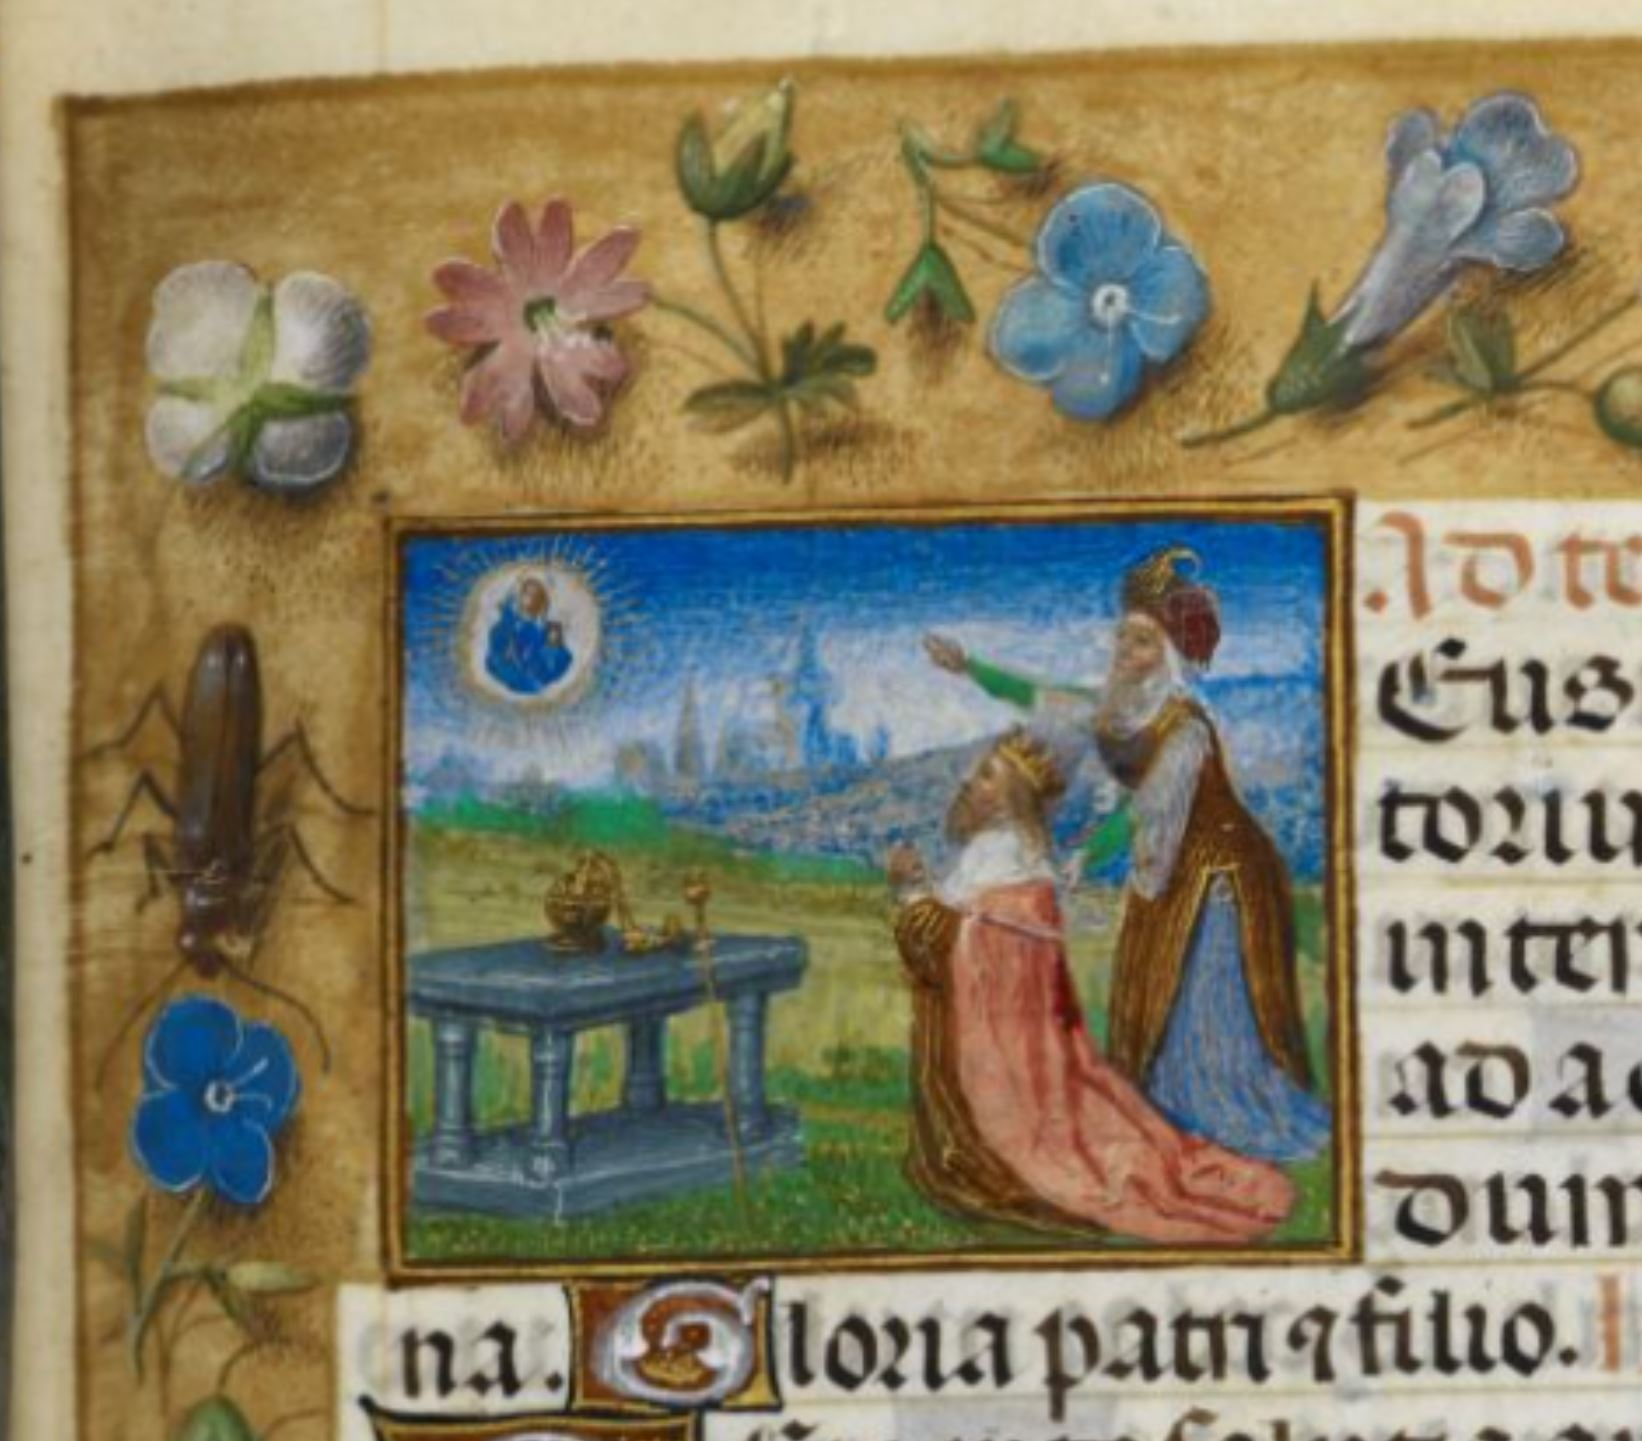 Huth Hours 1485-90 Auguste et la Sibylle BL Add MS 38126 fol 80r